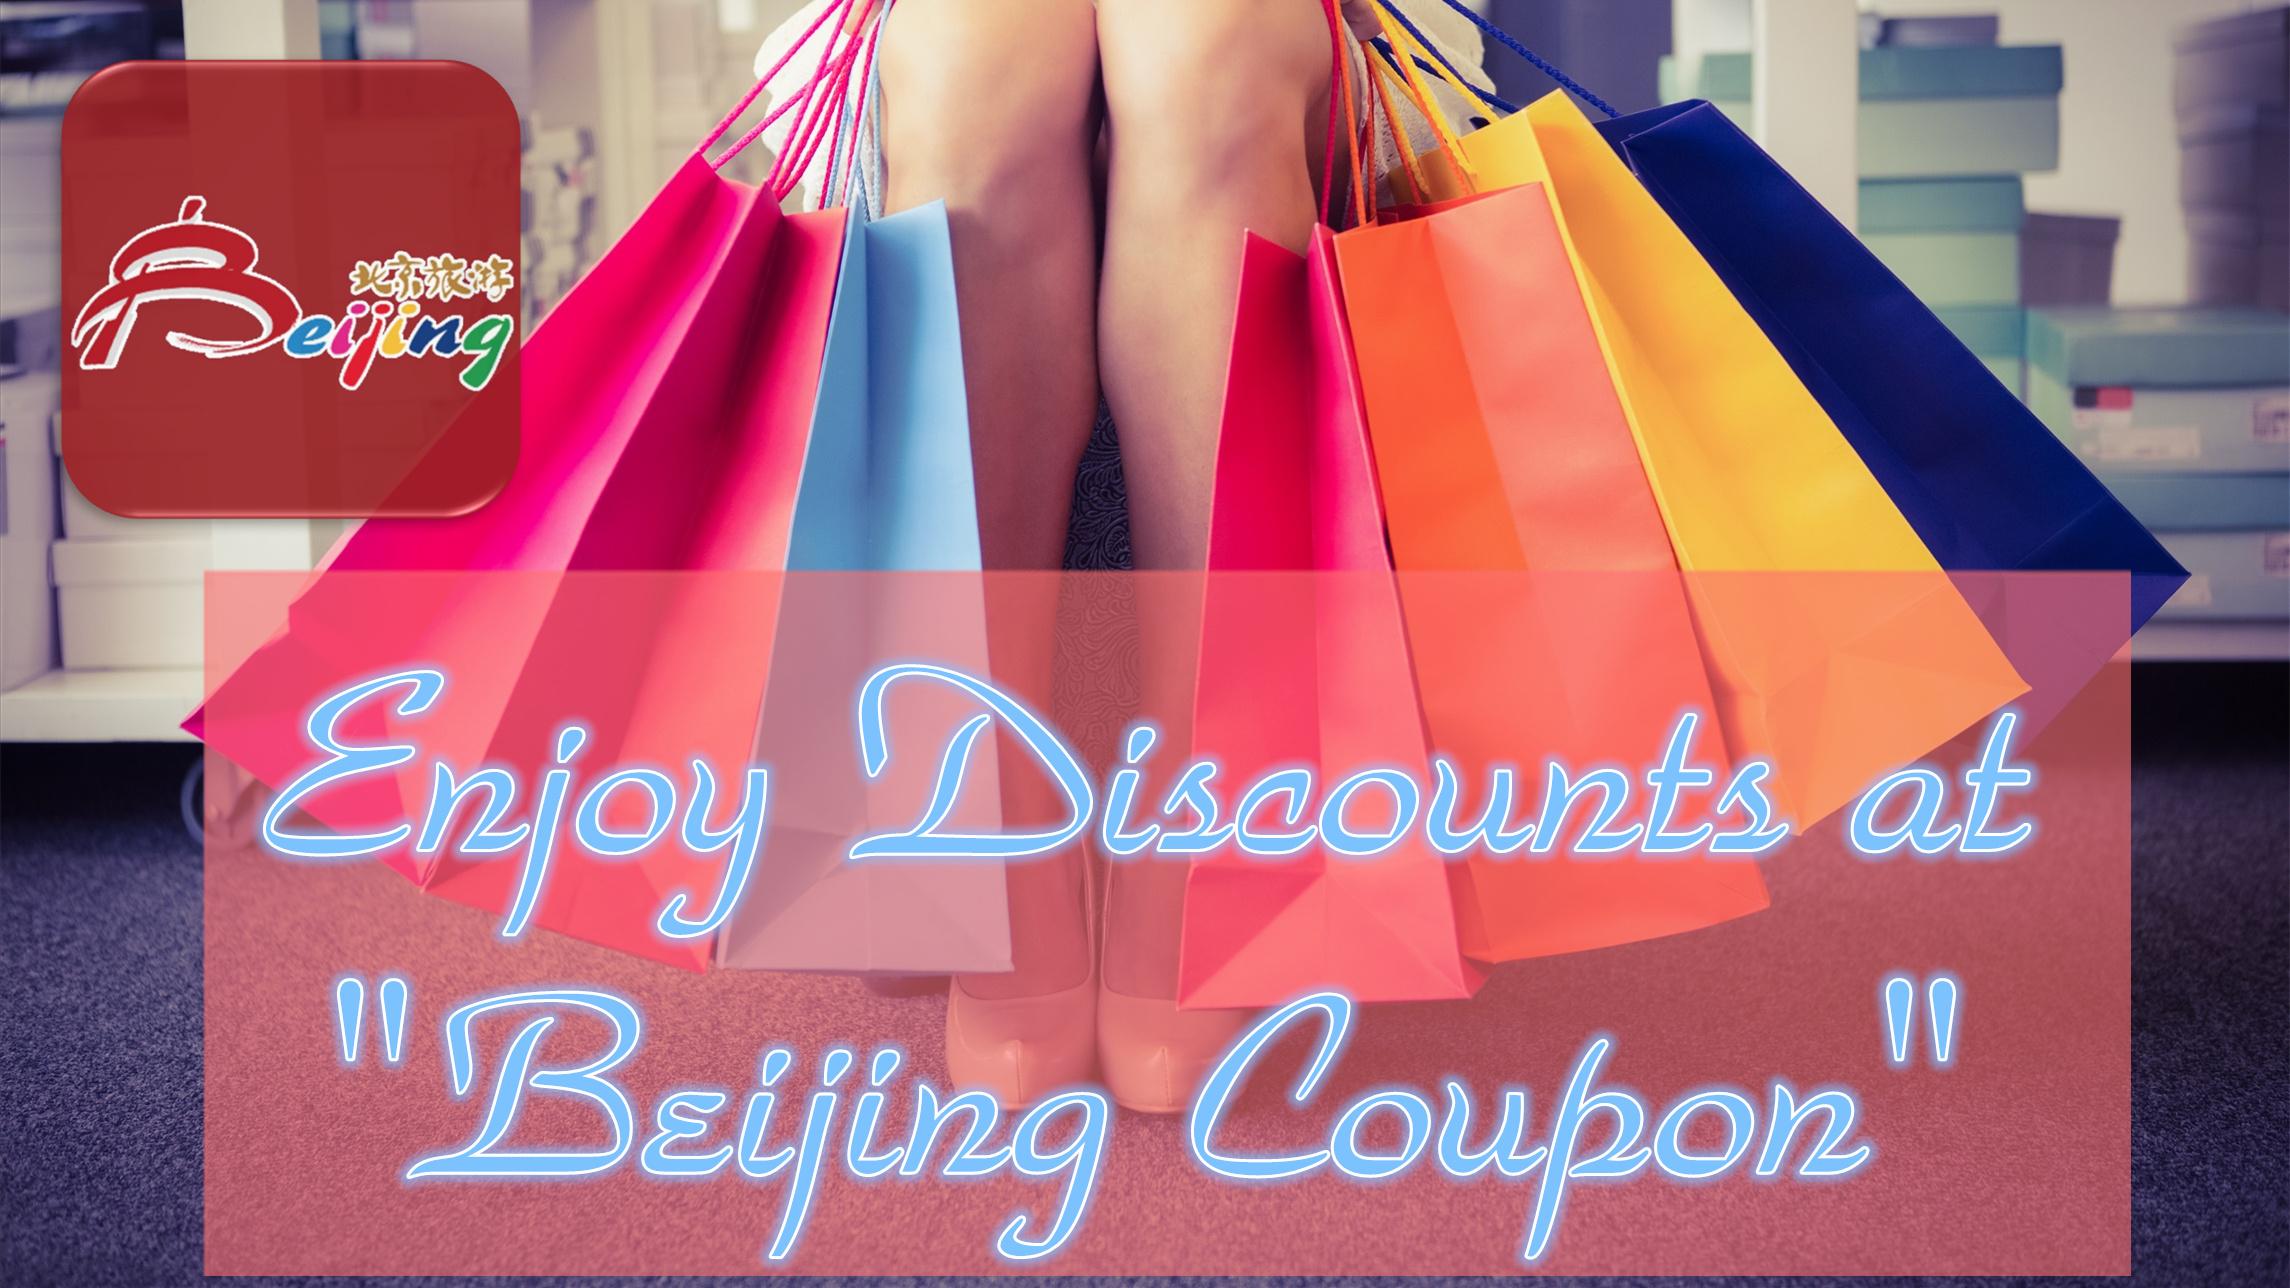 Enjoy Discounts at